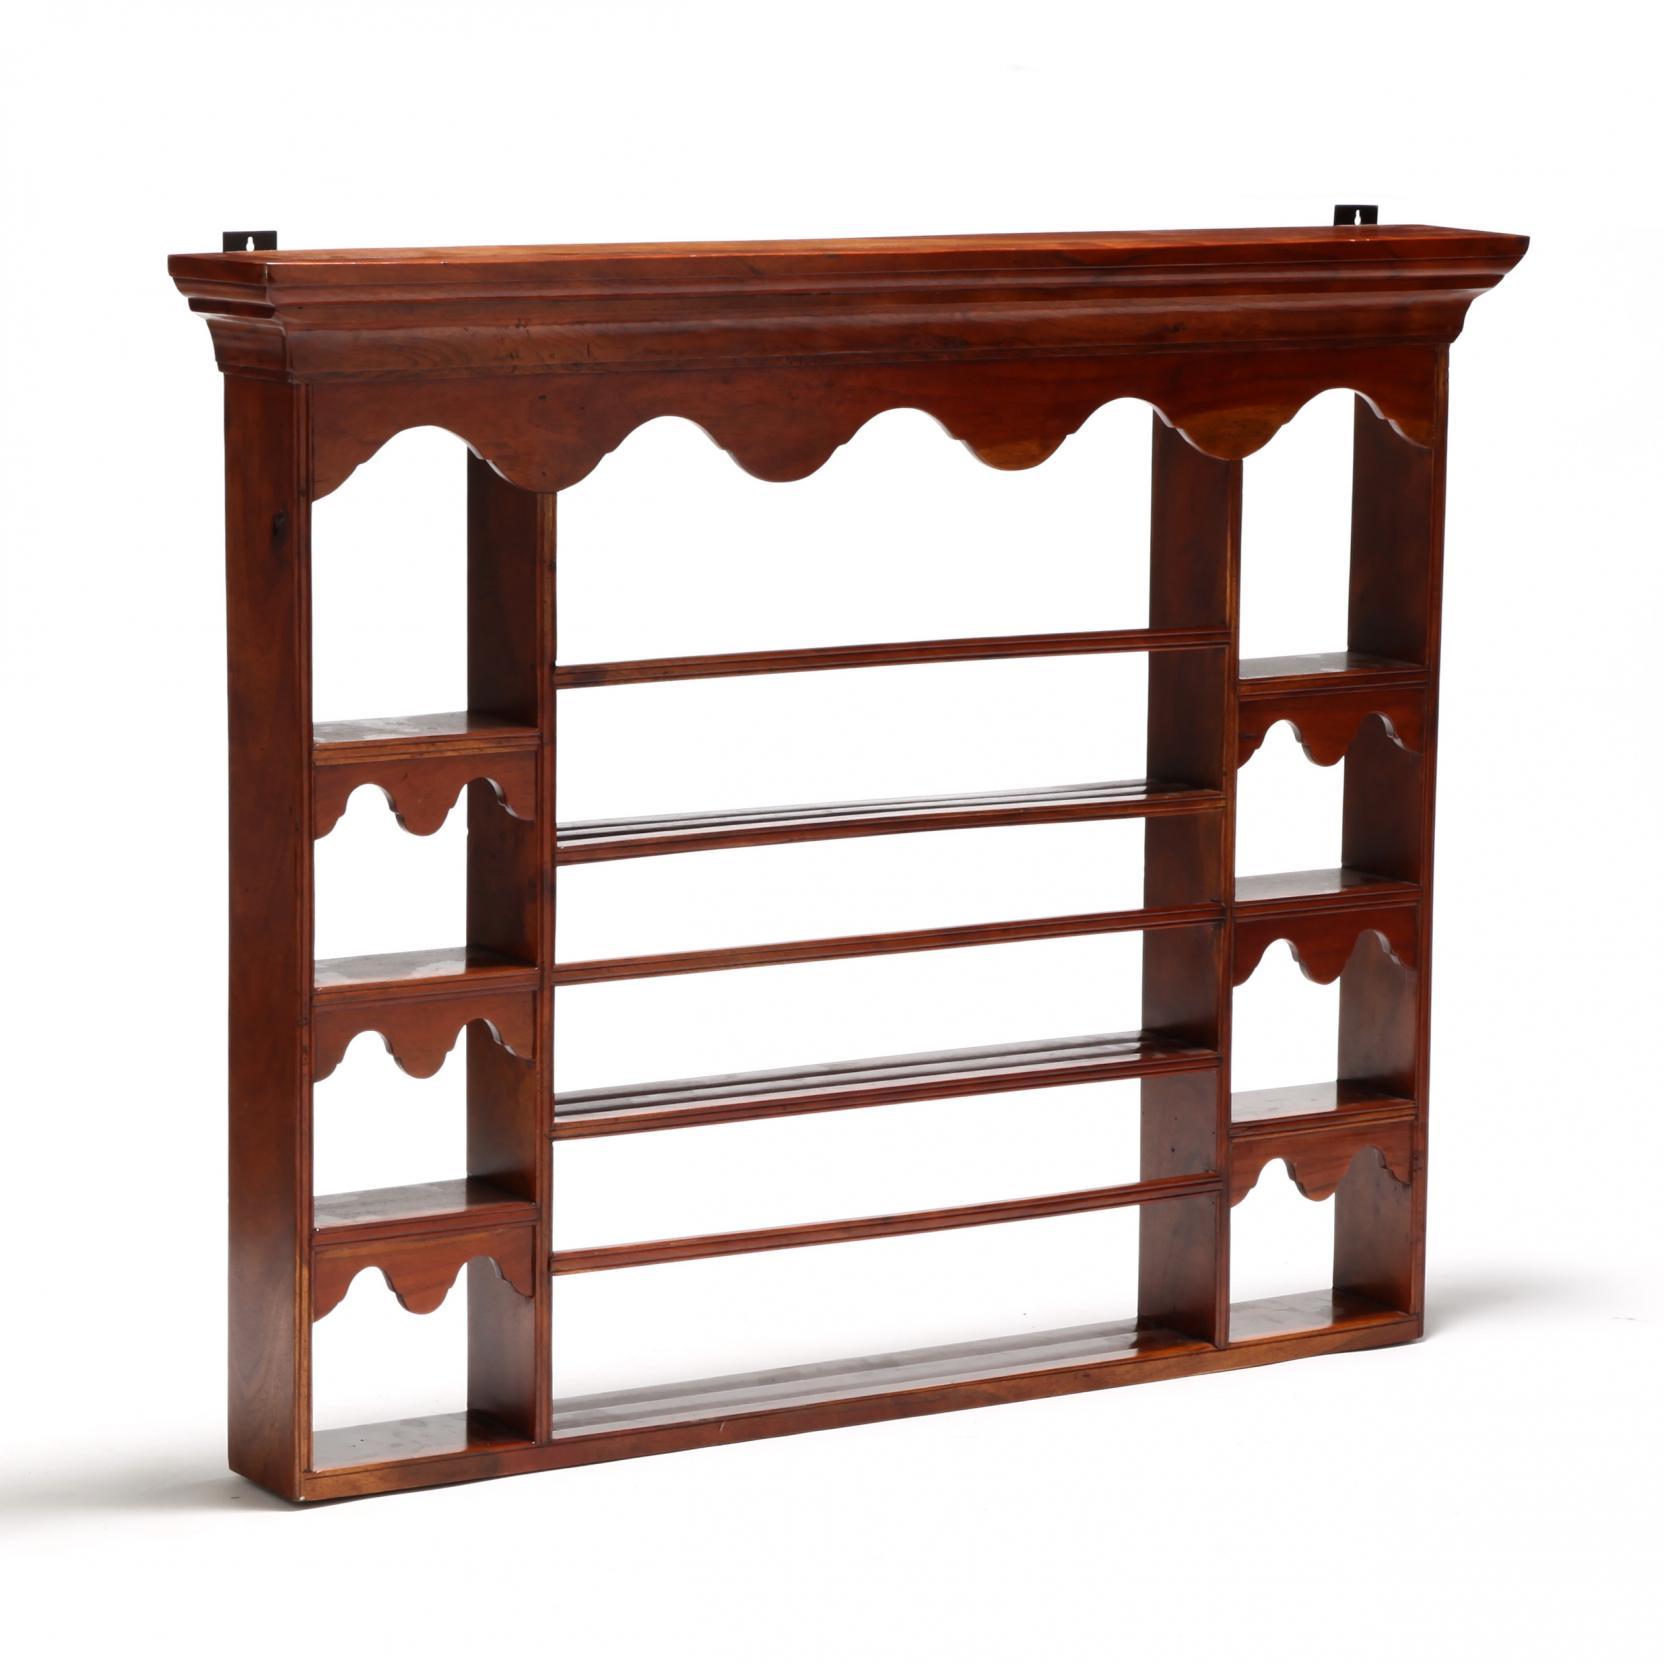 welsh-style-hanging-pewter-shelf